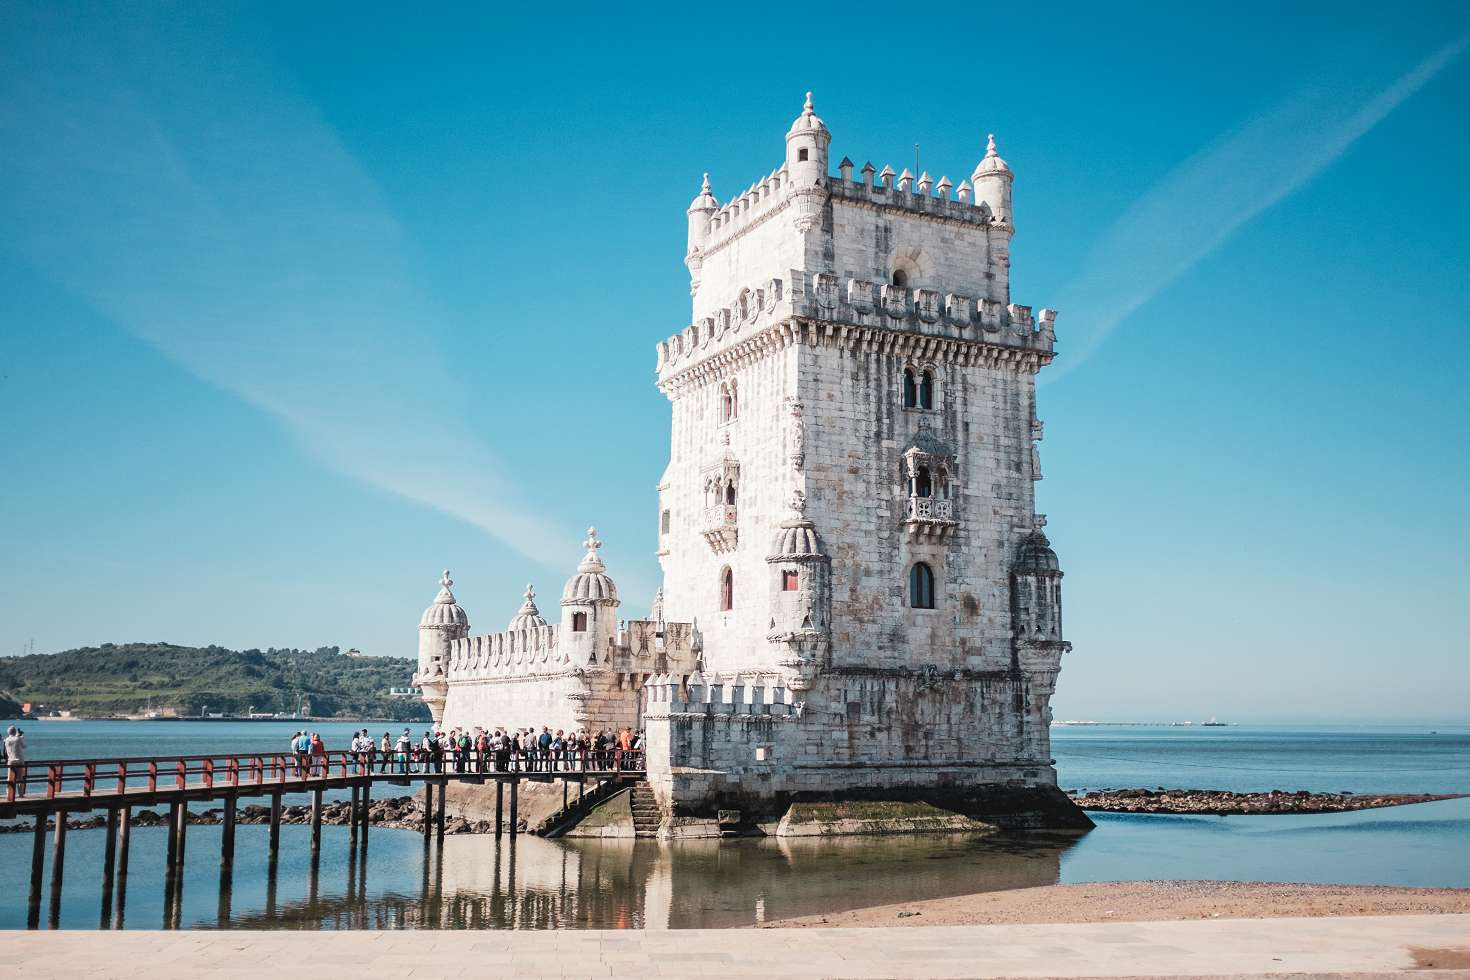 Valencia-Lissabon-Vigo-Stonehenge (16)